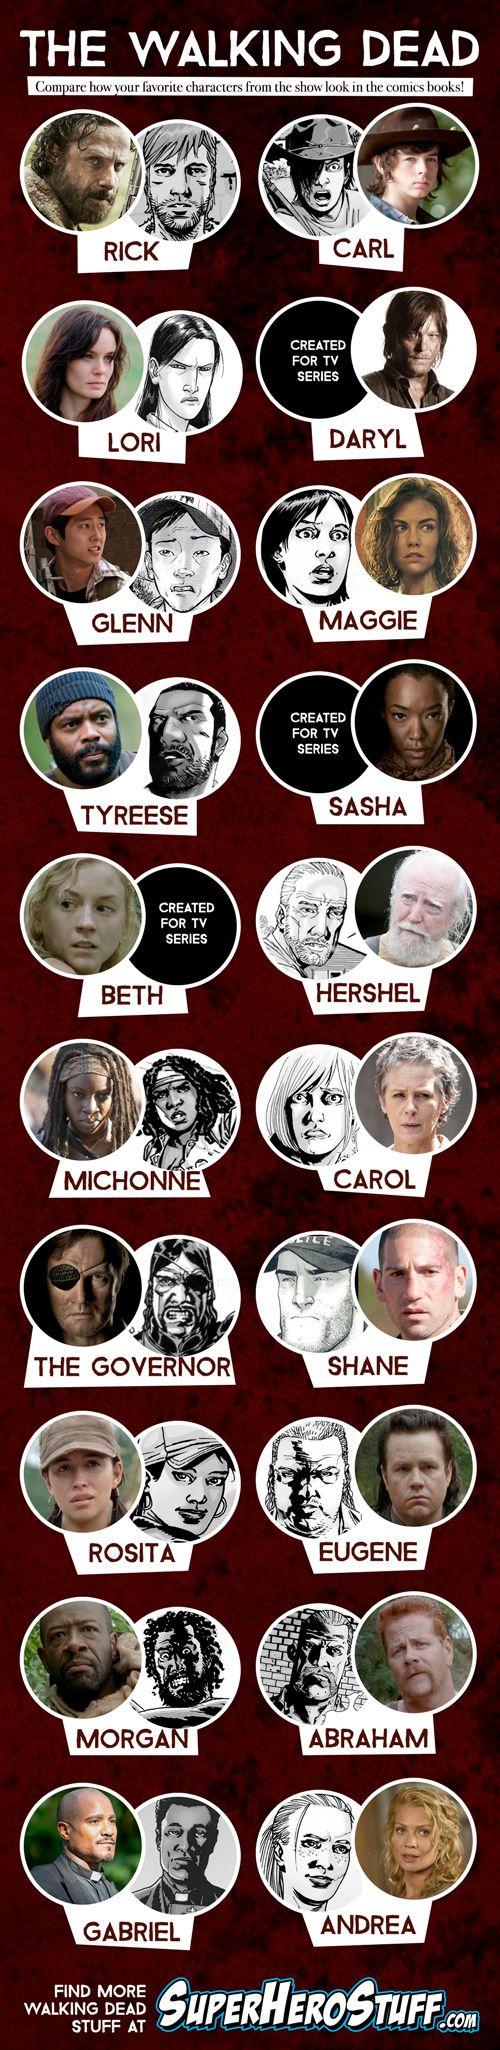 INFOGRAPHIC: The Walking Dead – TV vs Comics